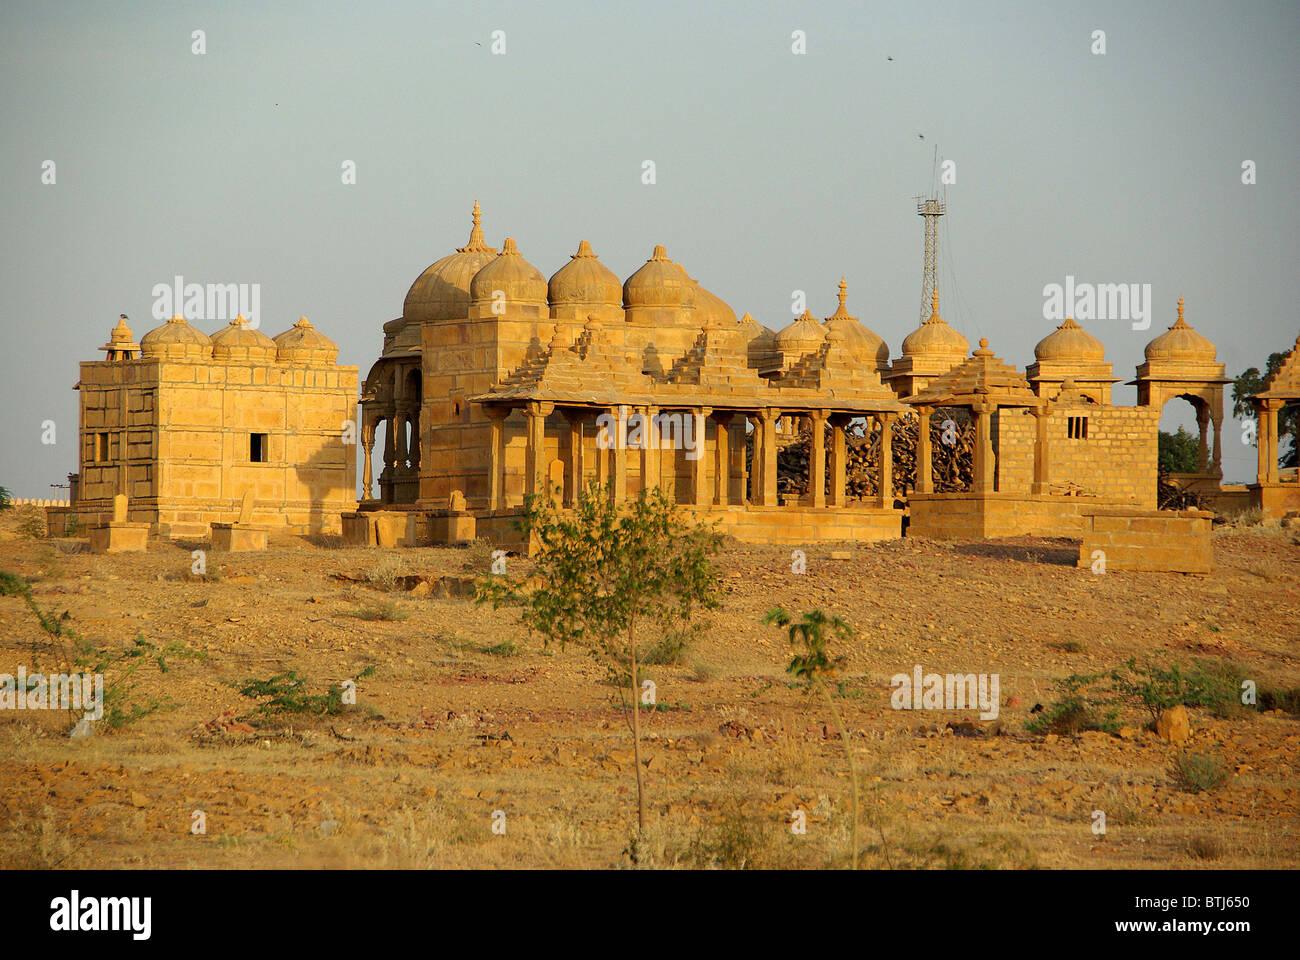 Rajput tombe nel Rajasthan, India Immagini Stock